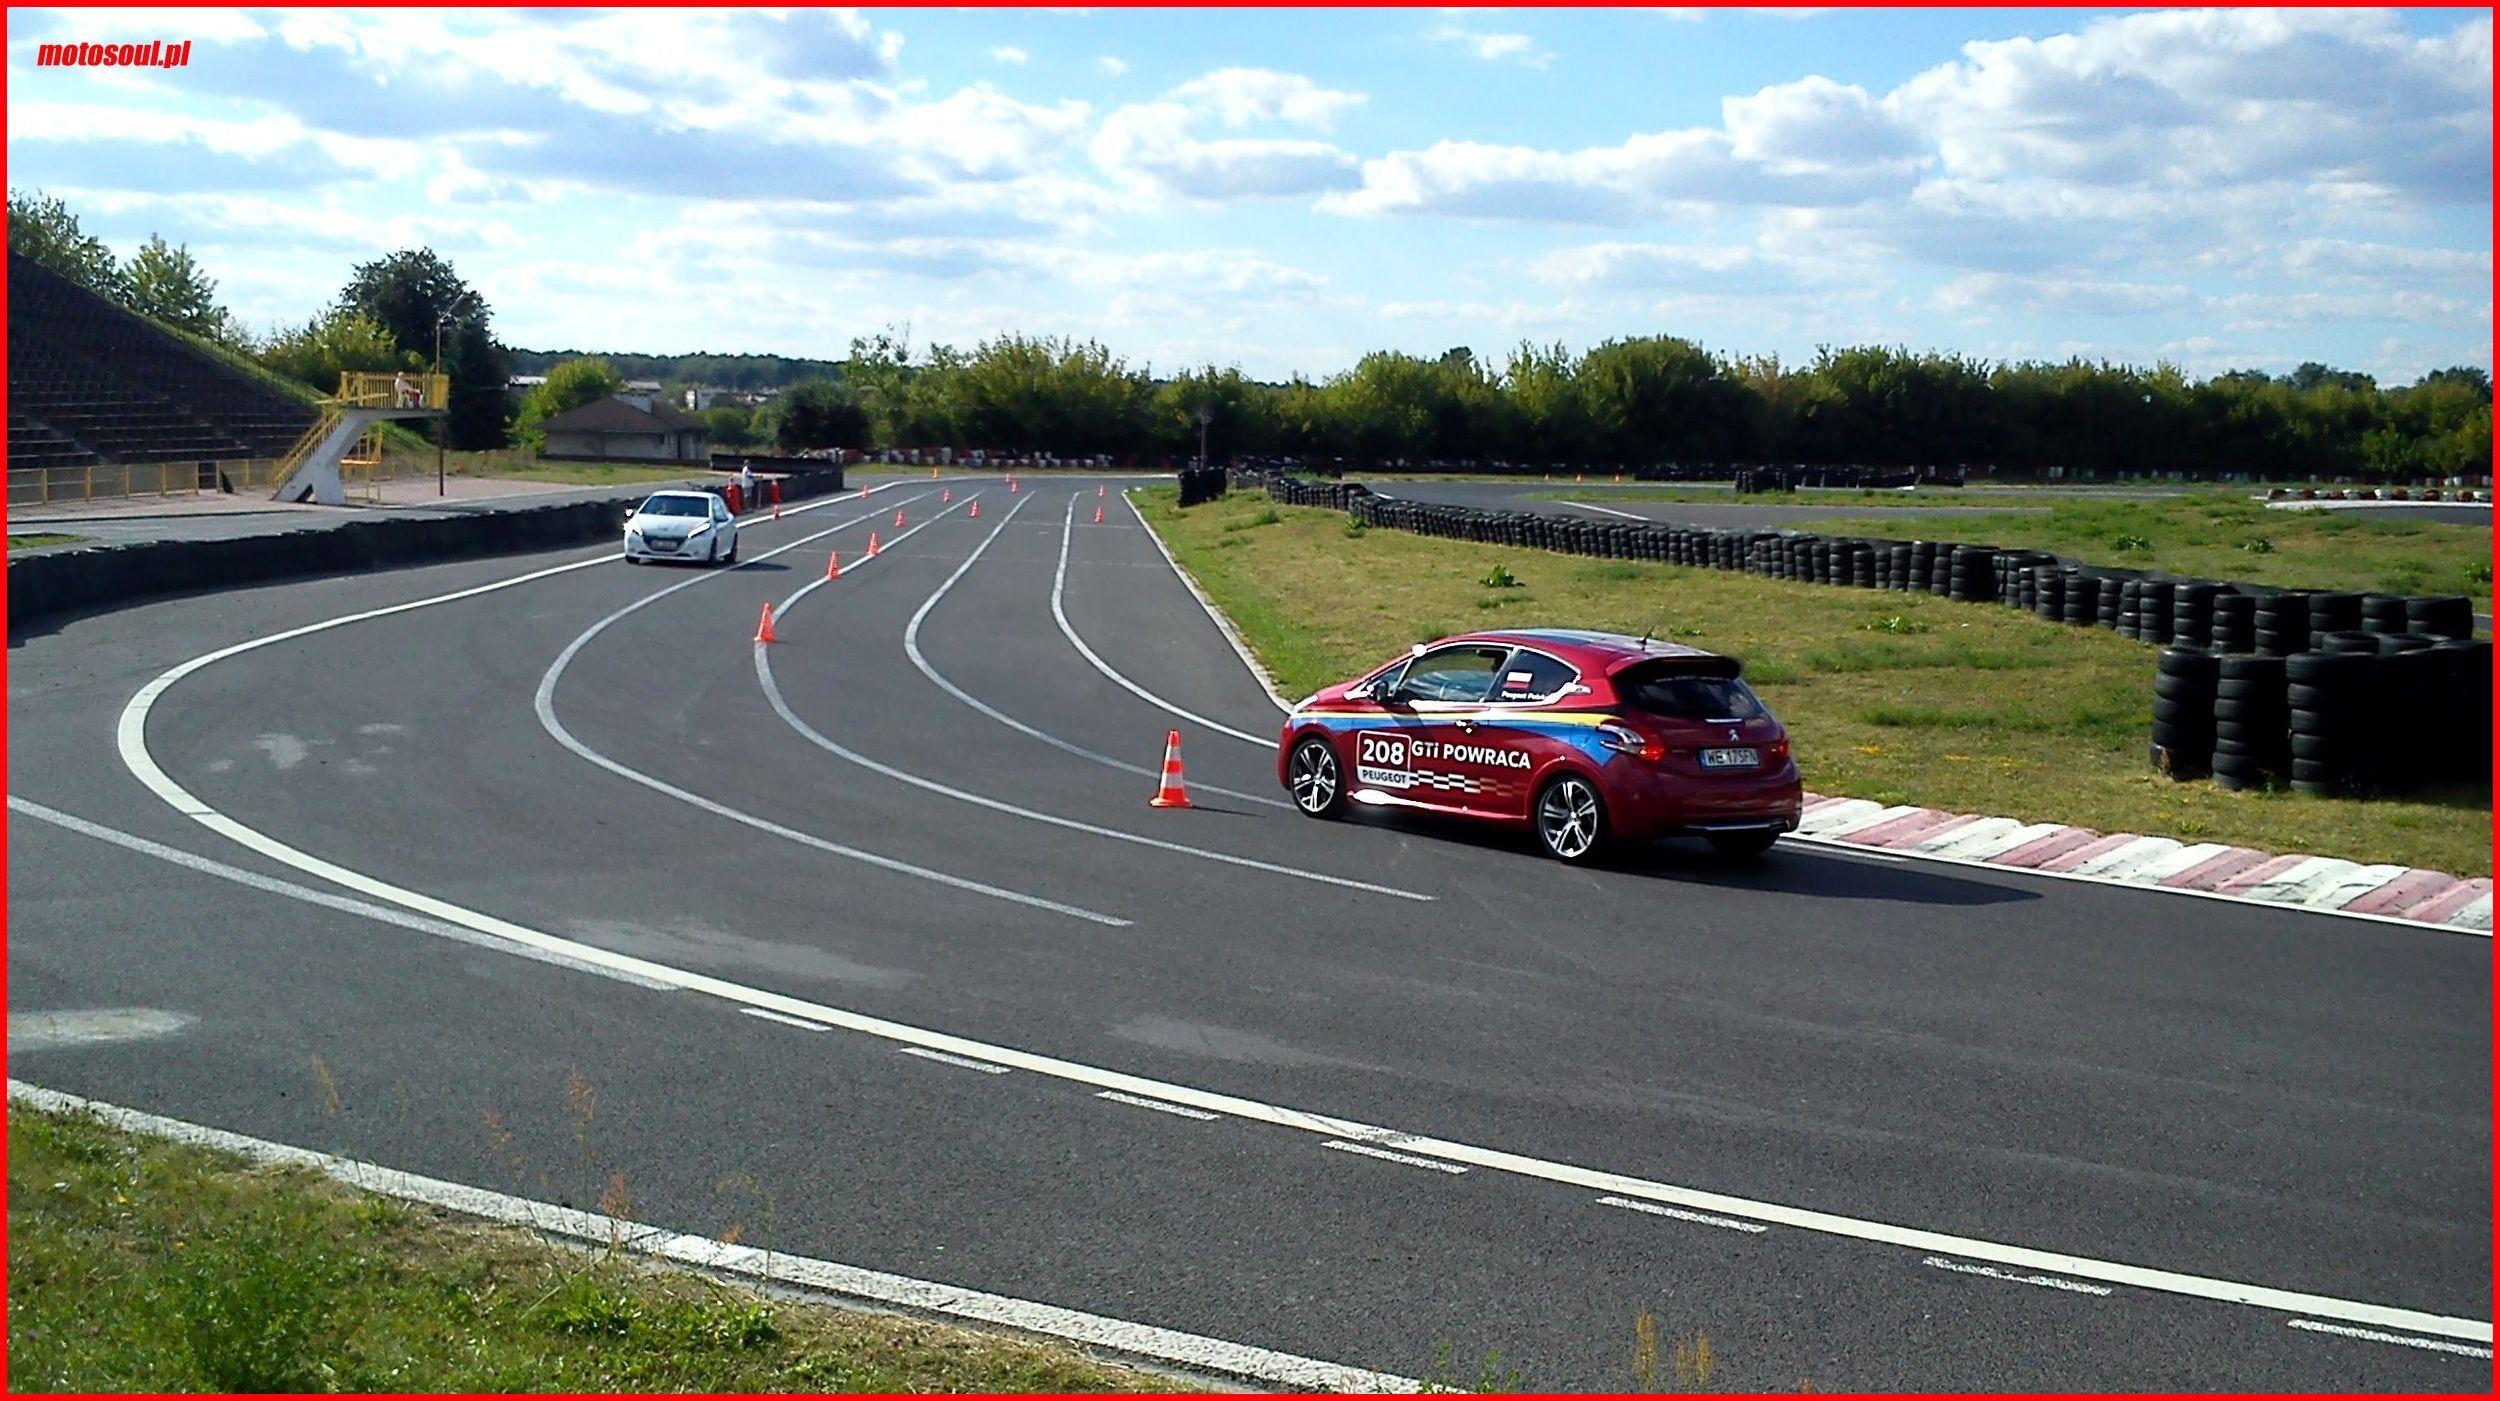 Próba czasowa Tor Radom Peugeot 208 GTI